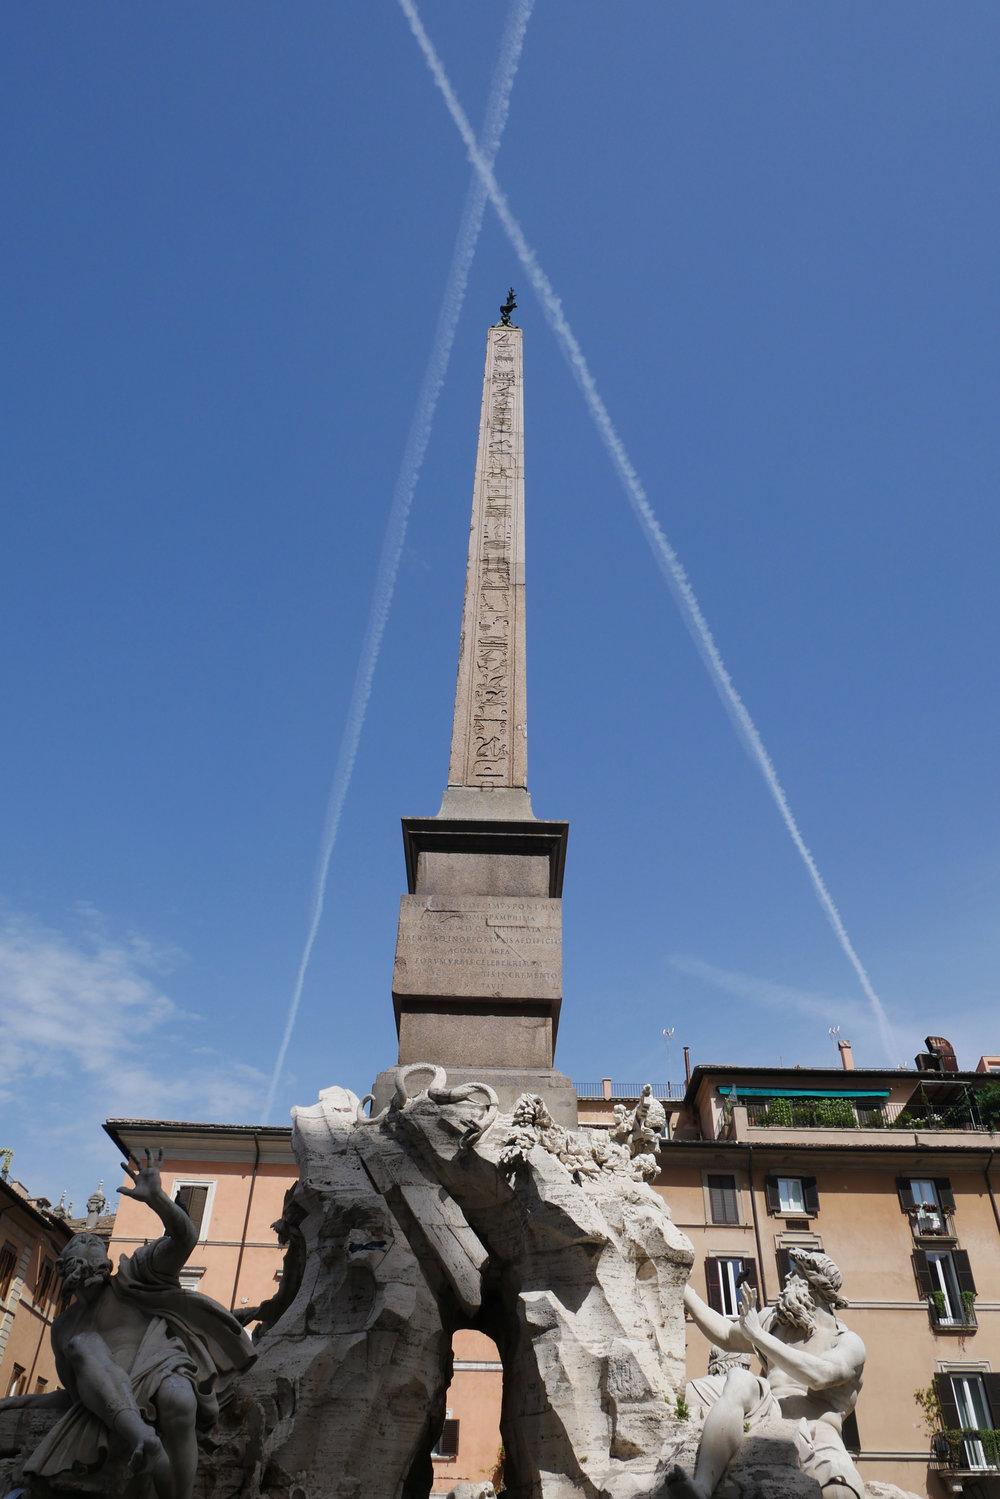 Egyptian-obelisk-Four-Rivers-Fountain-Piazza-Navona-Rome.jpg